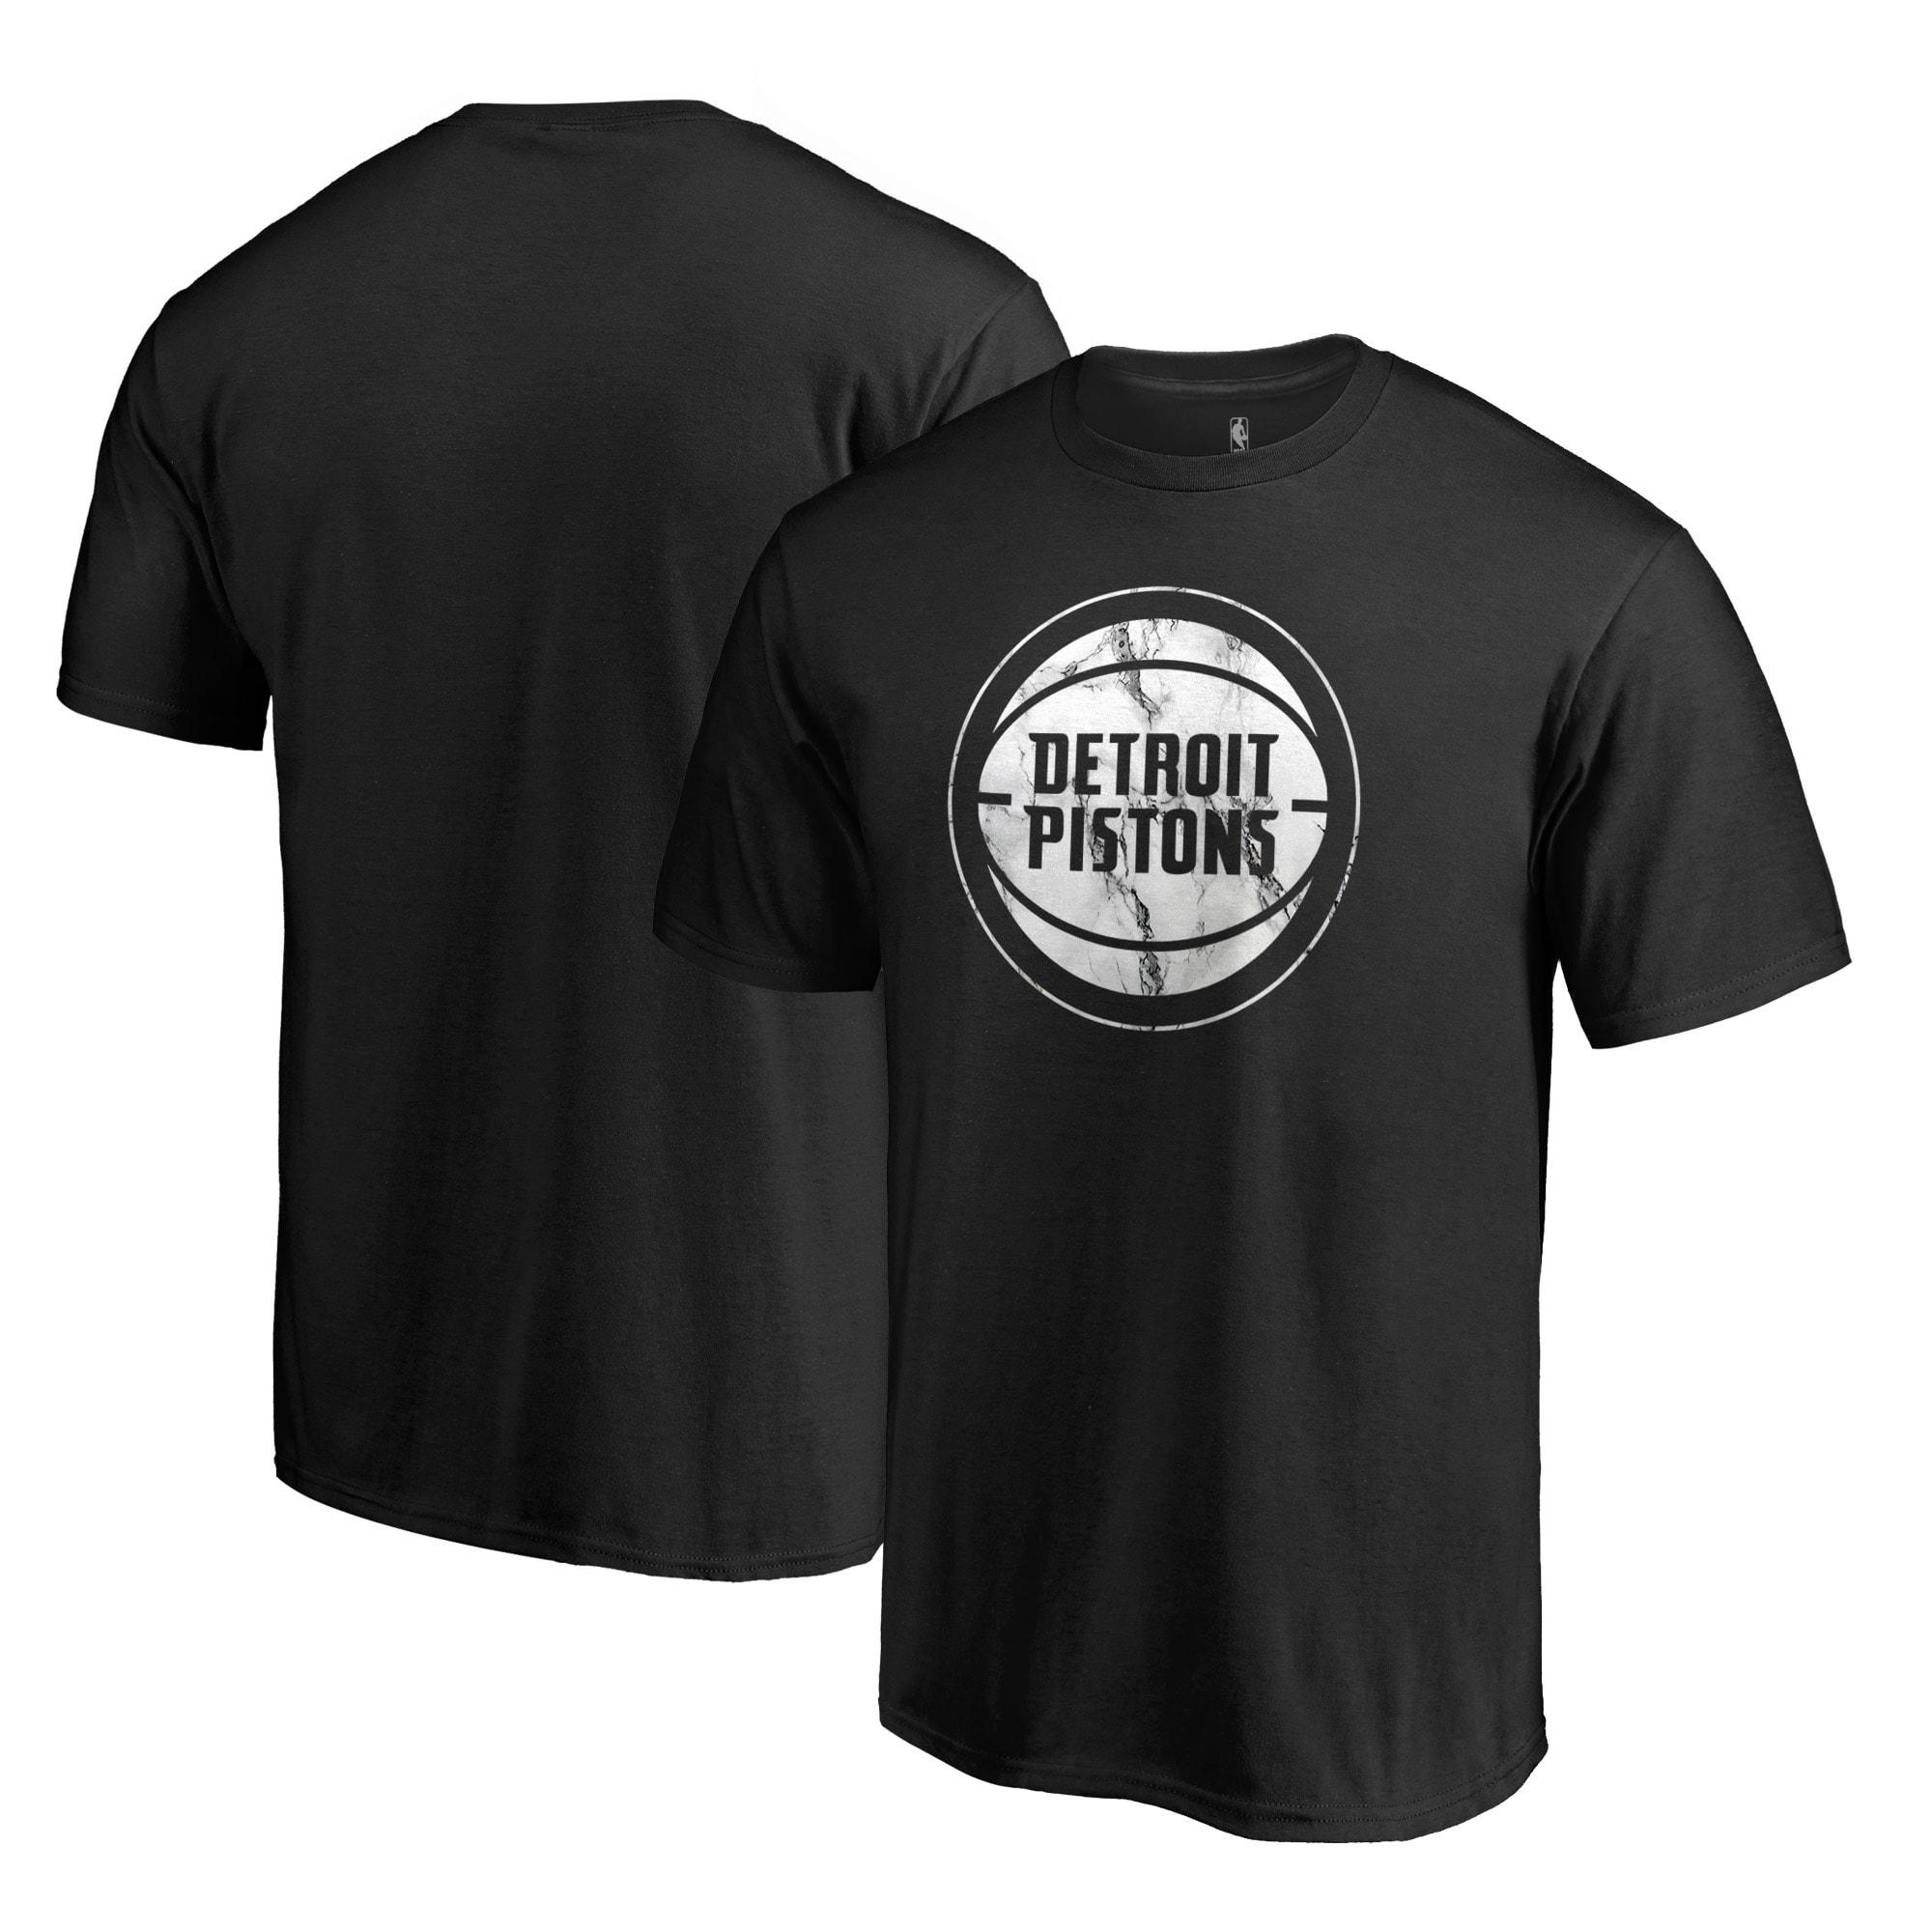 Detroit Pistons Fanatics Branded Marble Logo Big & Tall T-Shirt - Black